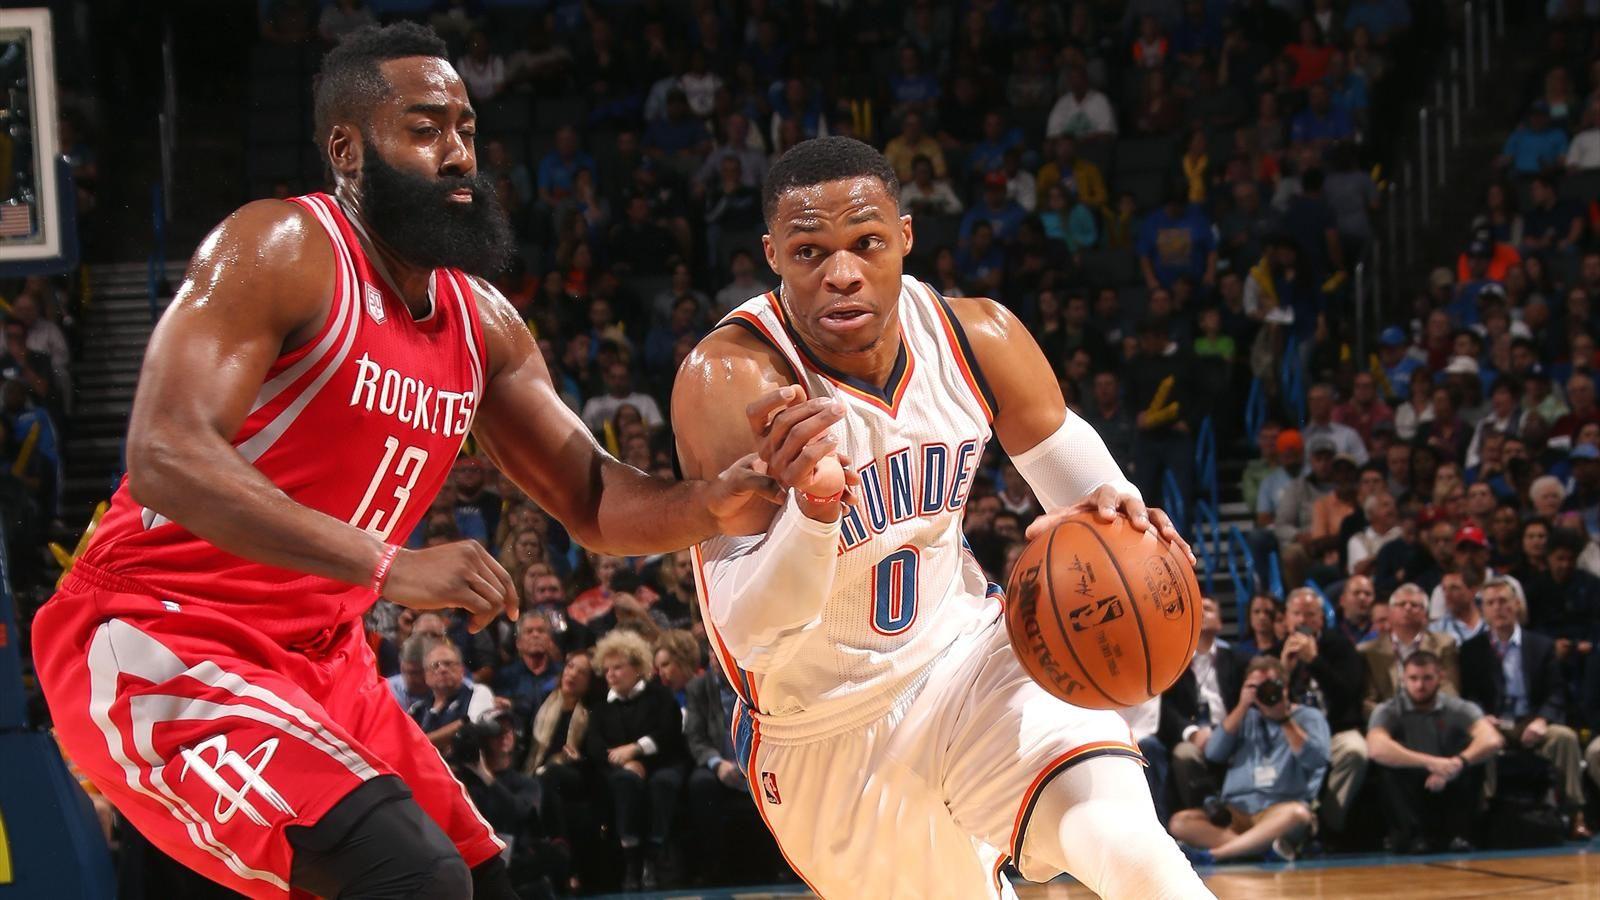 прогноз на матч НБА Хьюстон Рокетс – Оклахома-Сити Тандер